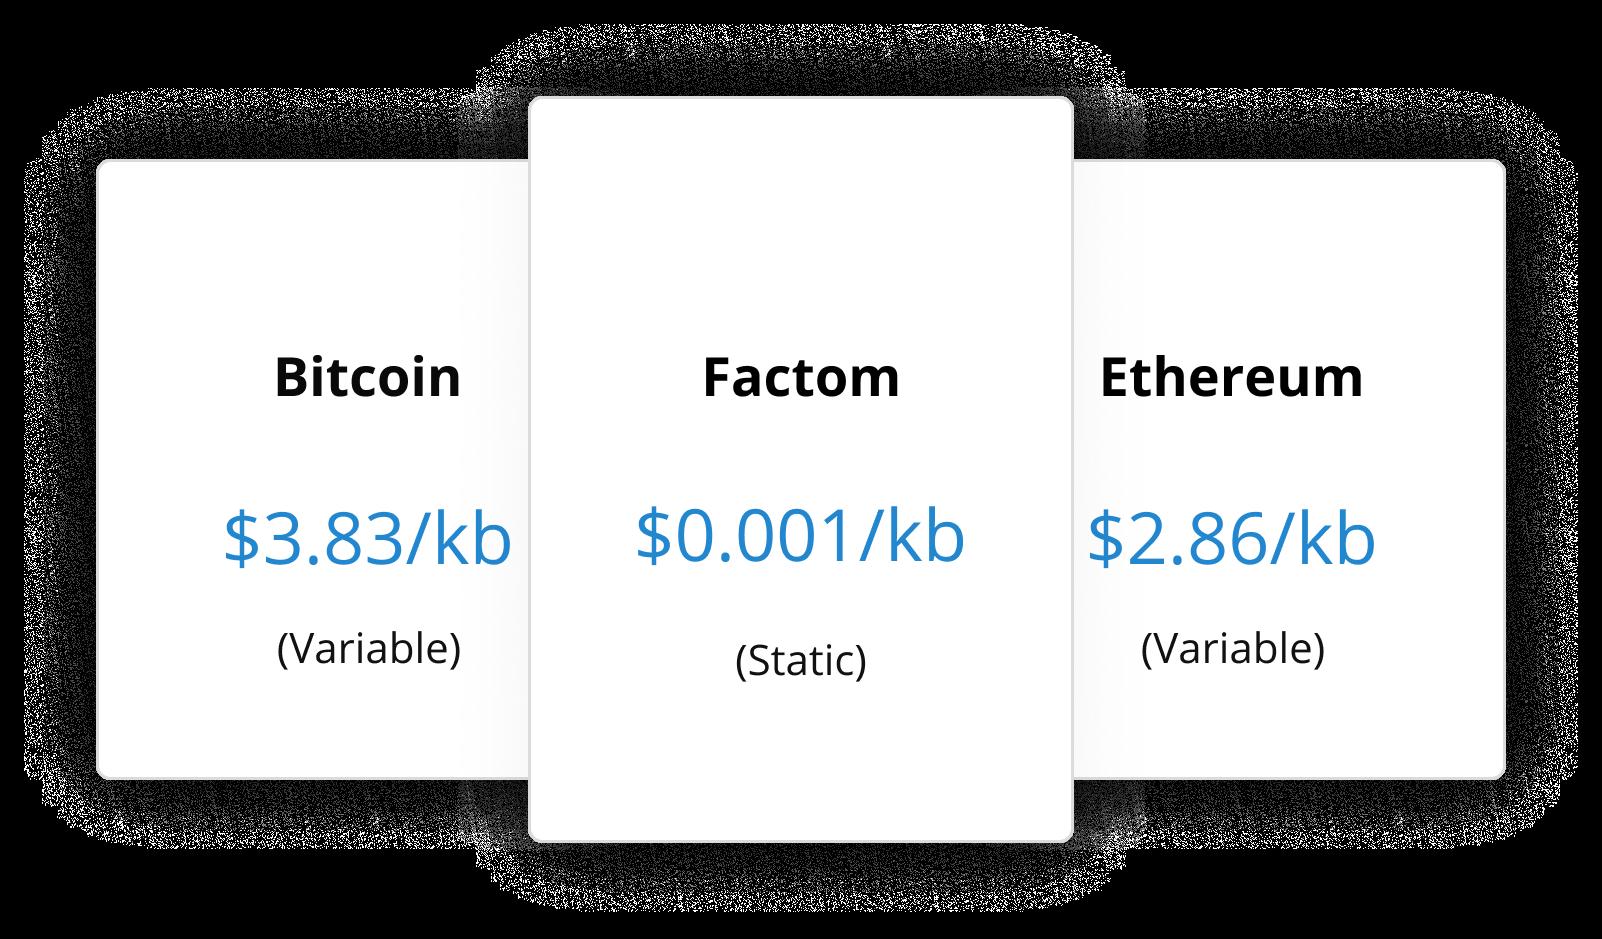 Factom low cost